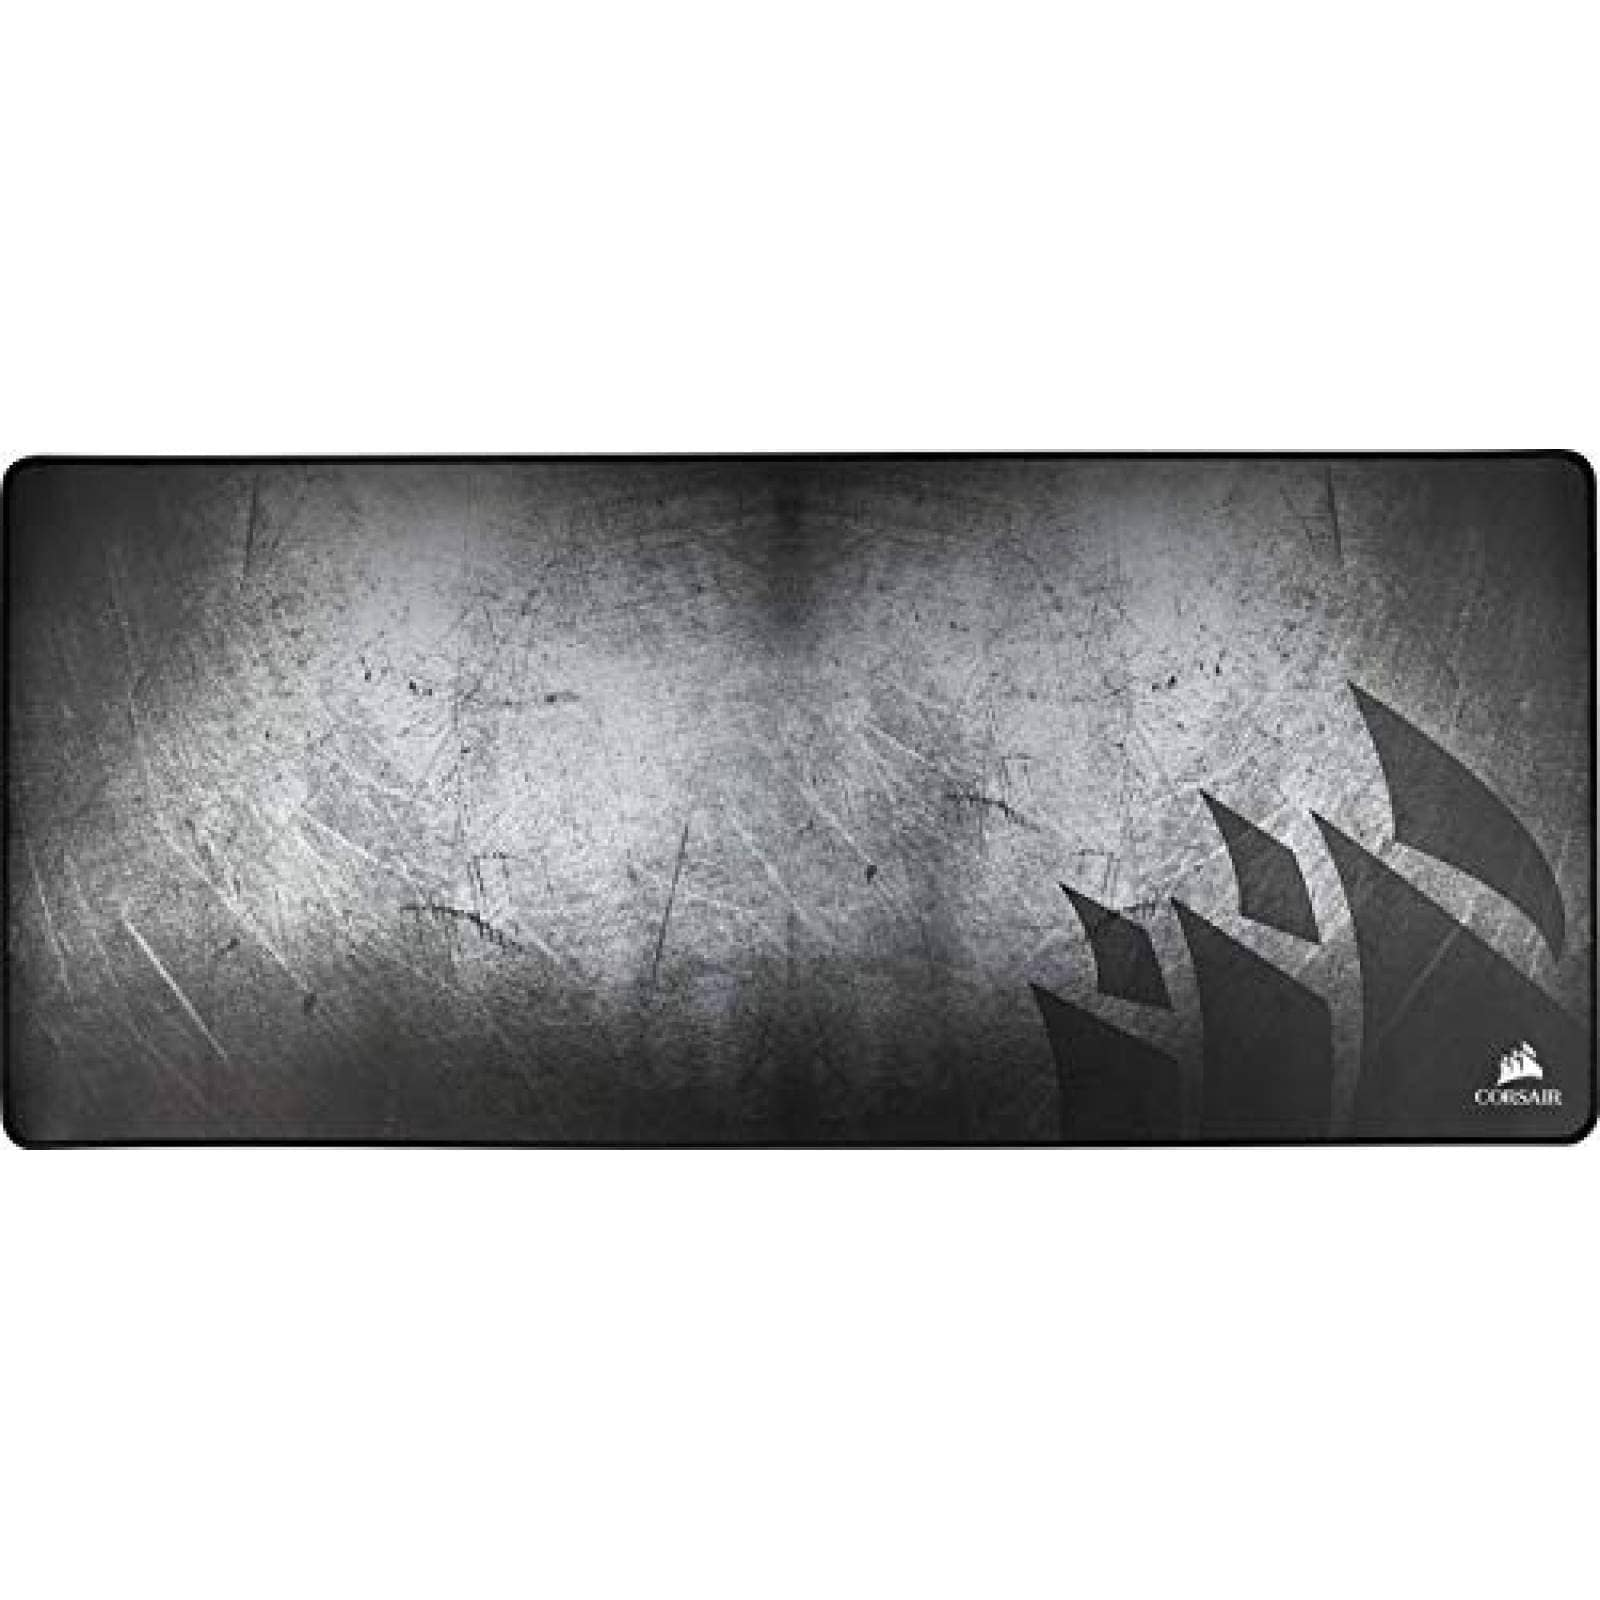 Mouse Pad Corsair MM350 antideslizante XL 93cm x 40cm